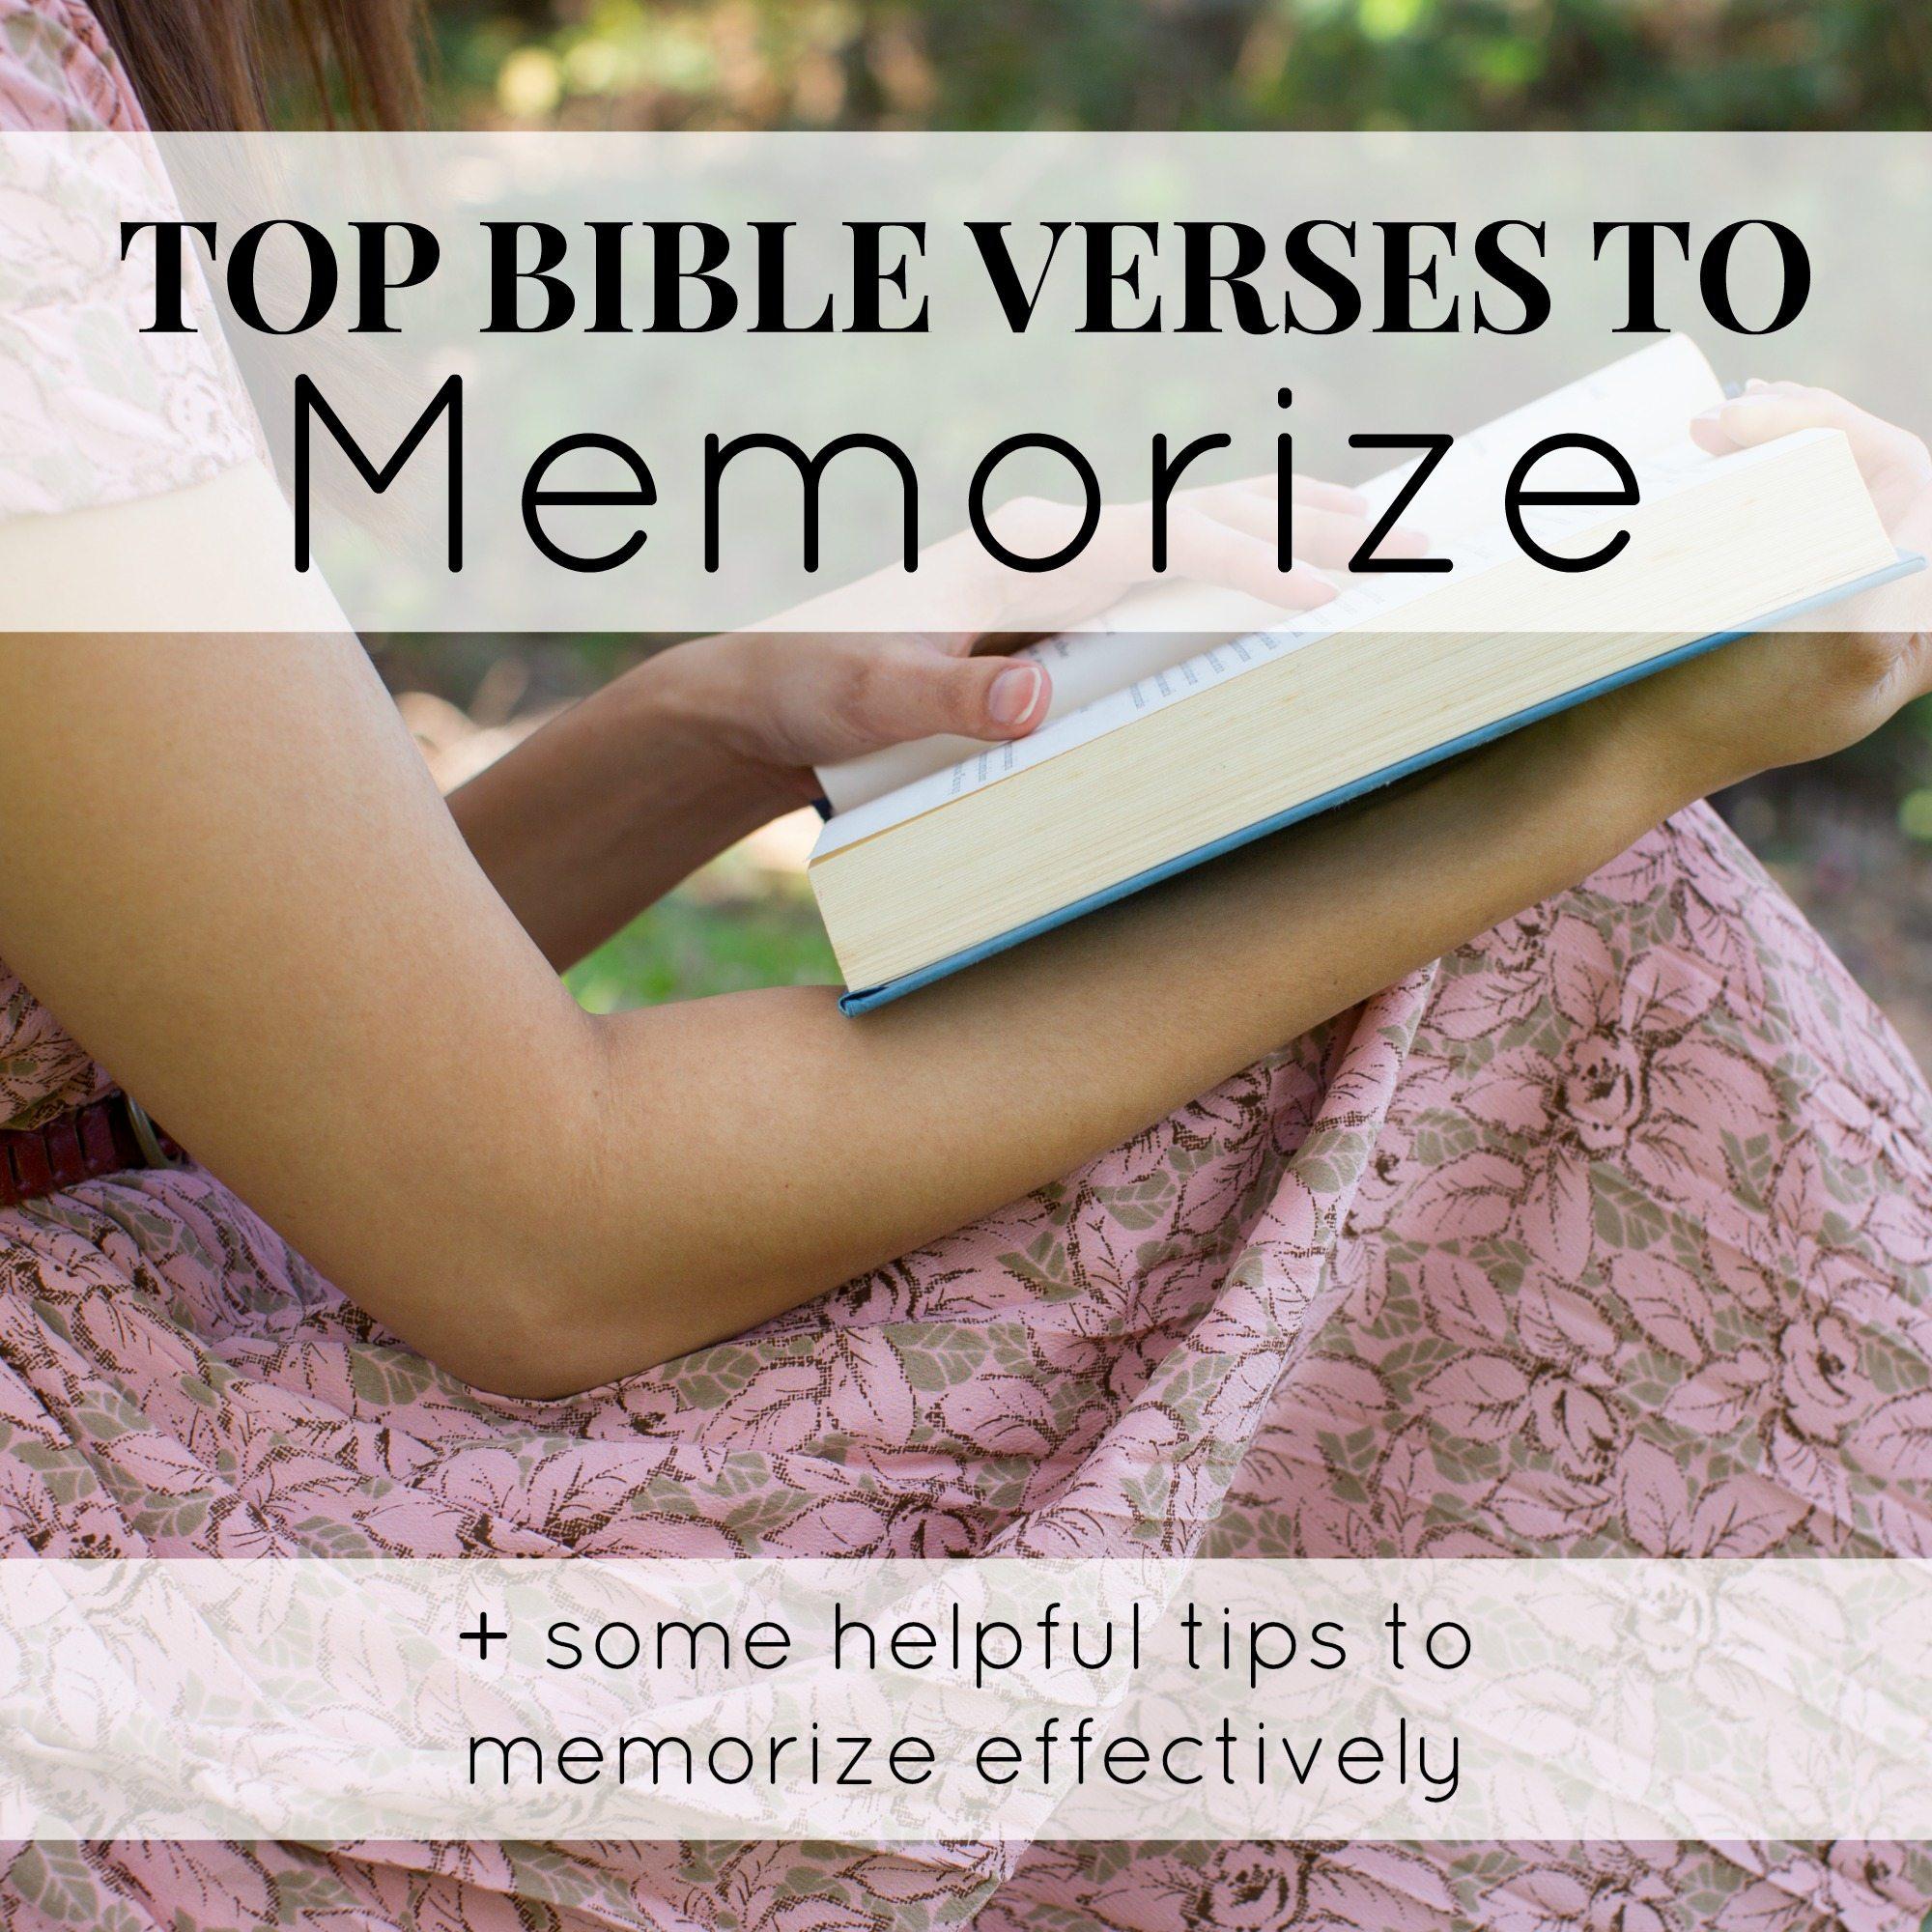 Top Bible Verses to Memorize